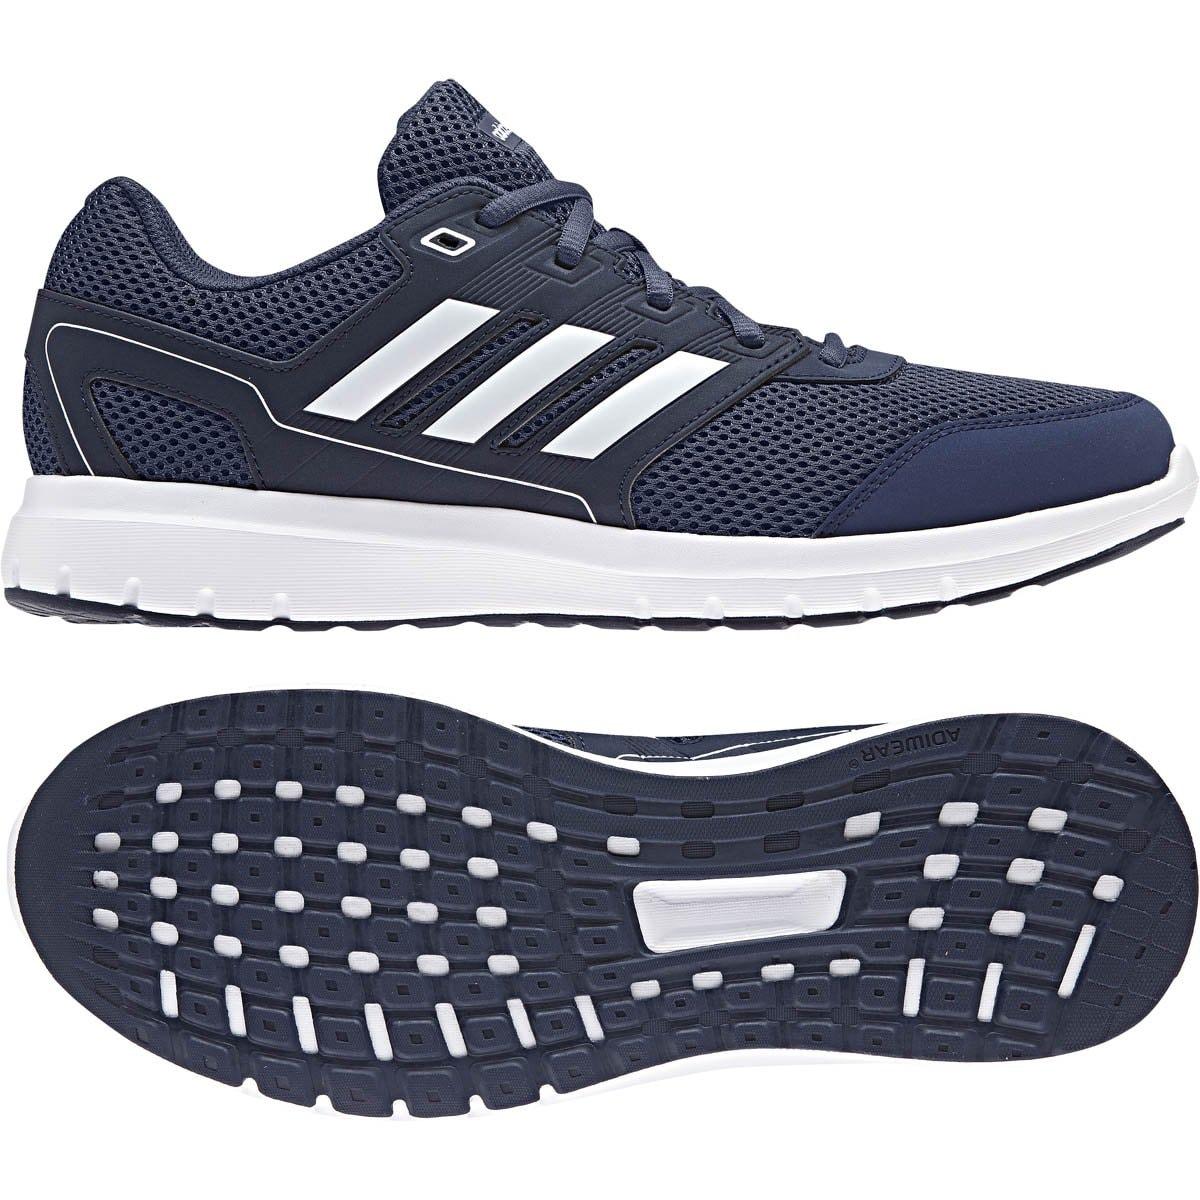 Tenis Running Duramo Lite 2.2 Adidas - Caballero